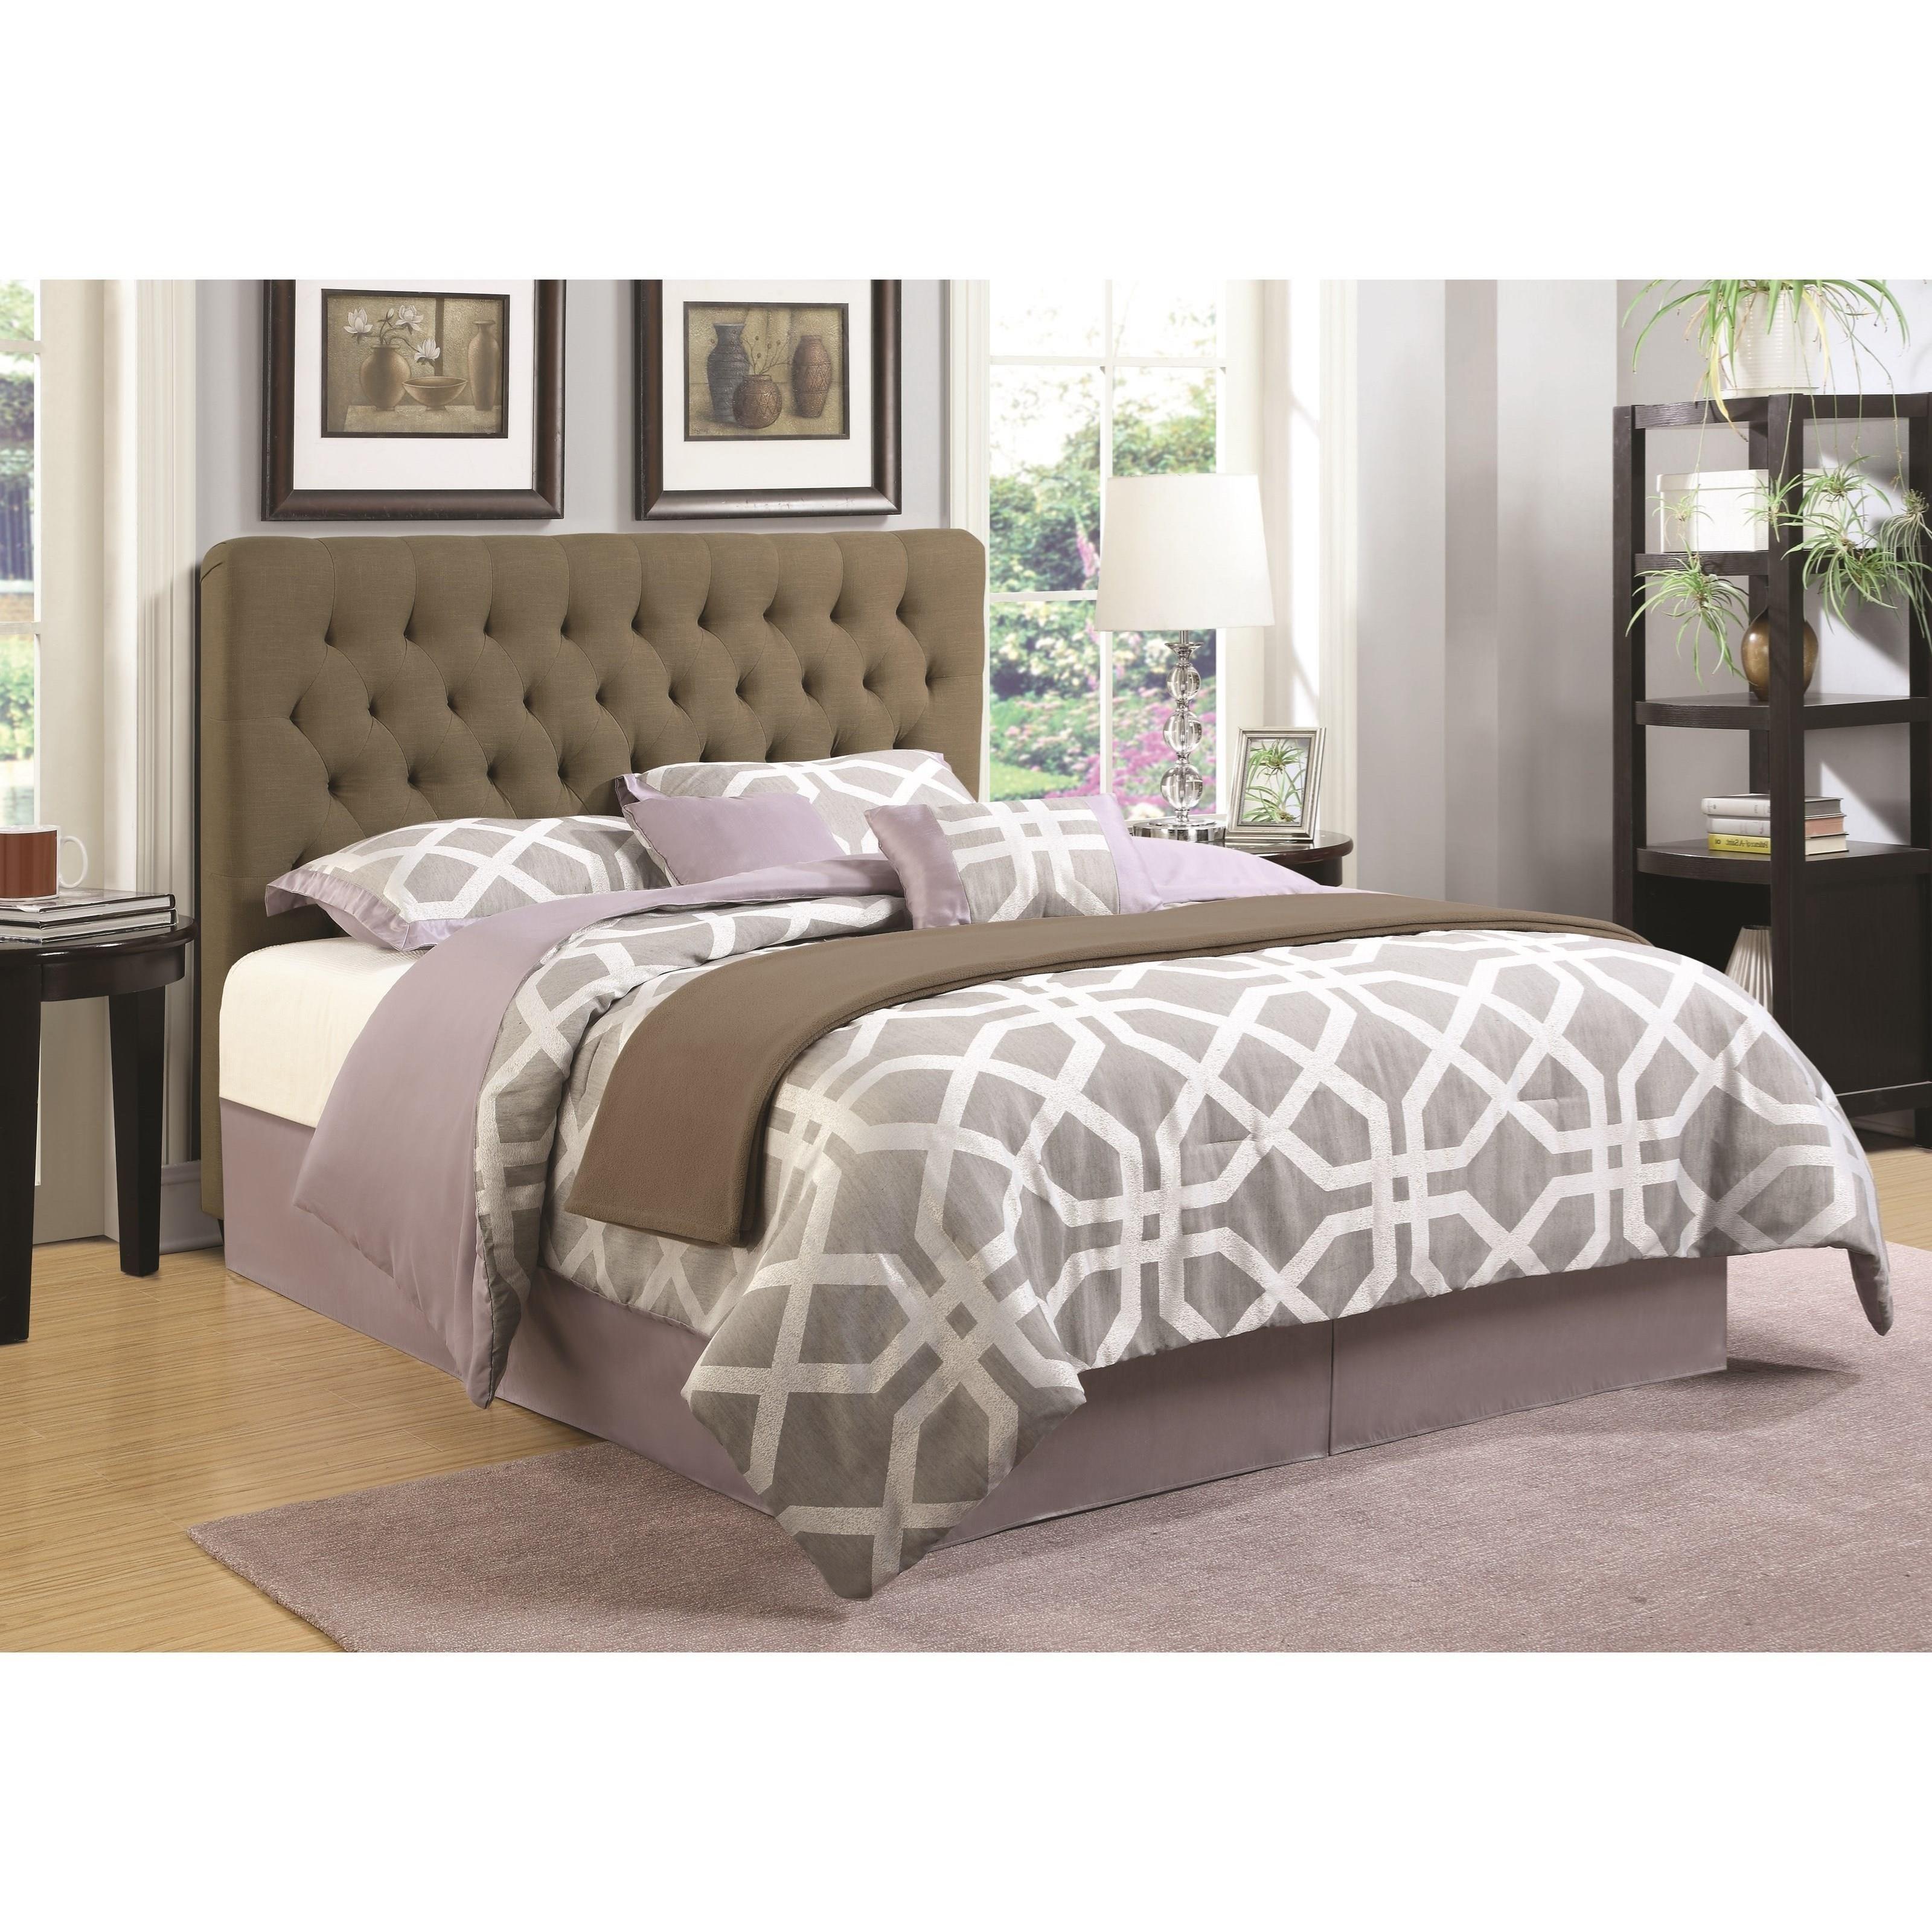 Coaster Upholstered Beds Full Headboard - Item Number: 300528FB1